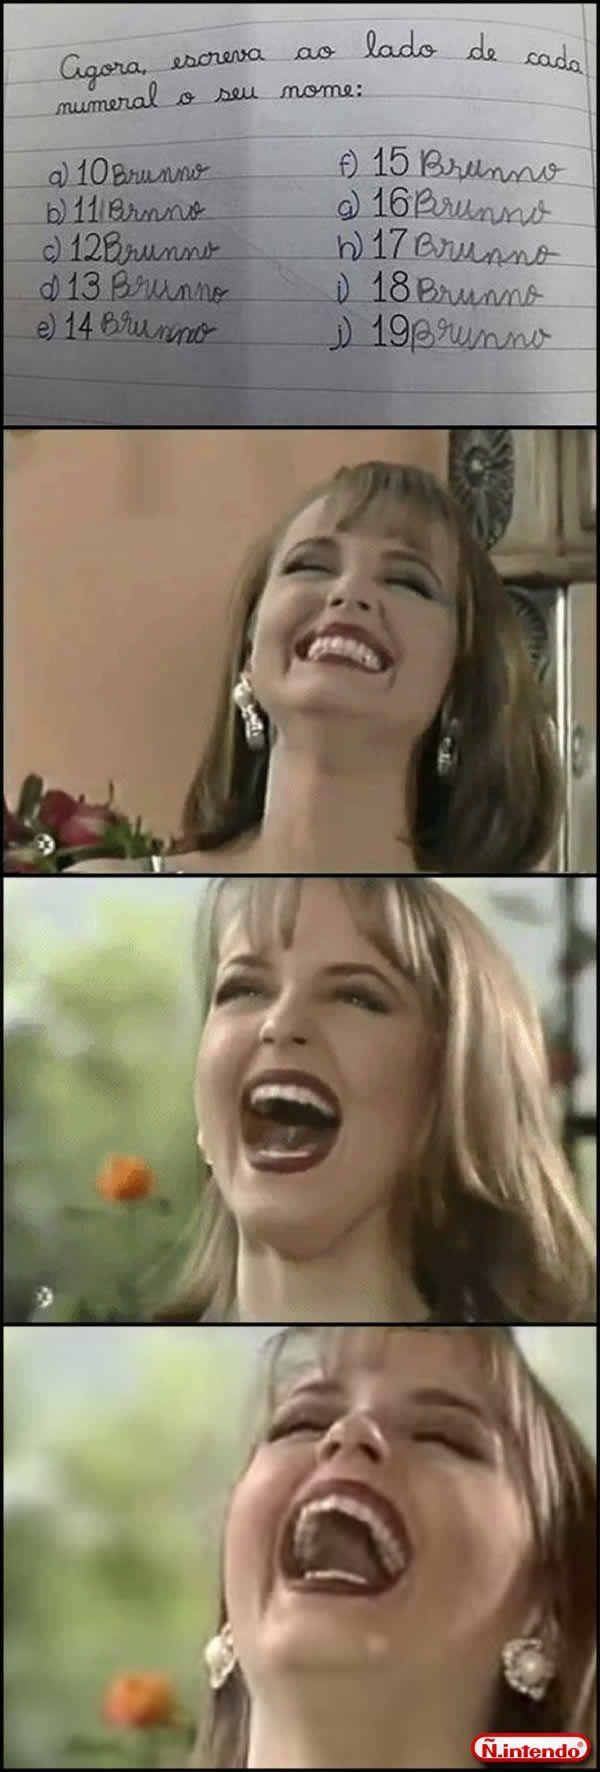 O (a) professor(a) eu rio deles e não do aluno. Como dizia Paola: A impotência me faz cruel!   MOSCA MORTA!! Hahahah Hahahah